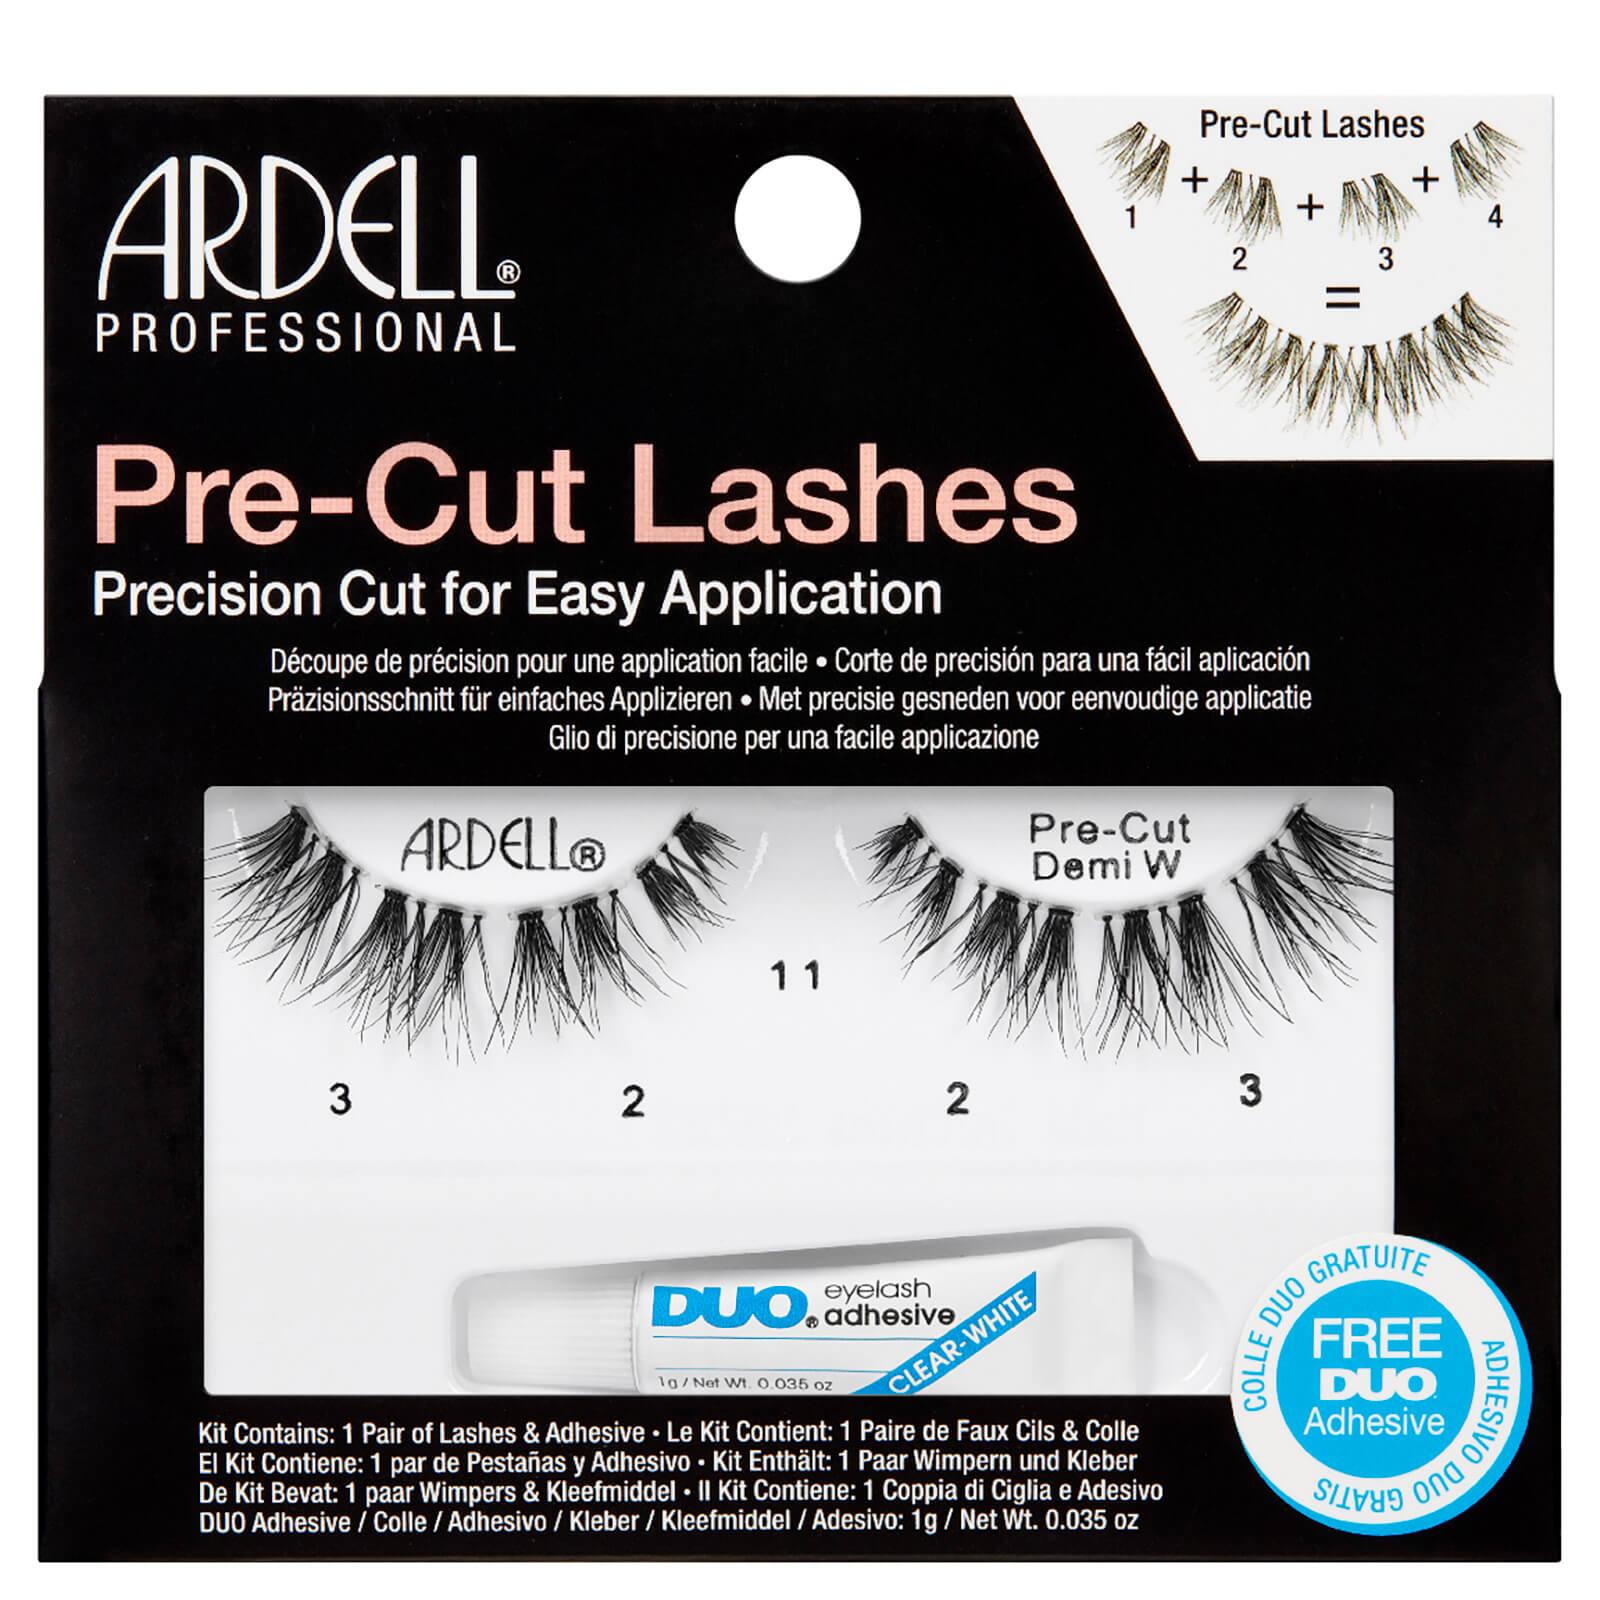 03dbe2a7758 Ardell Pre-Cut Demi Wispies   Free Shipping   Lookfantastic